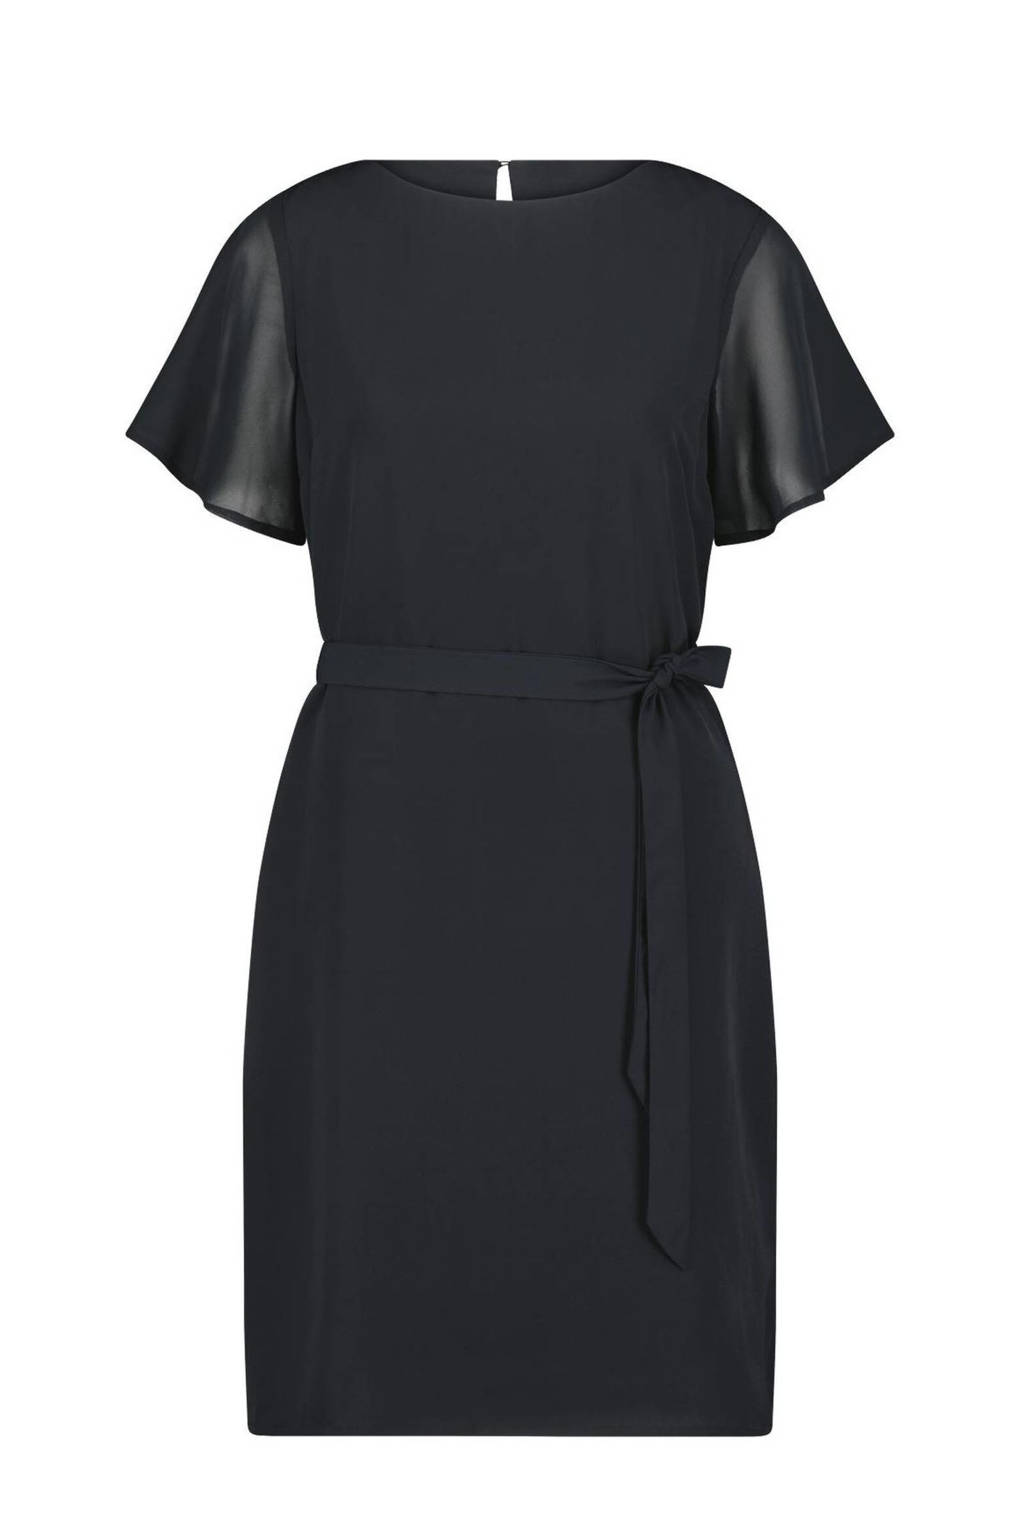 HEMA jurk Thalia zwart, Zwart